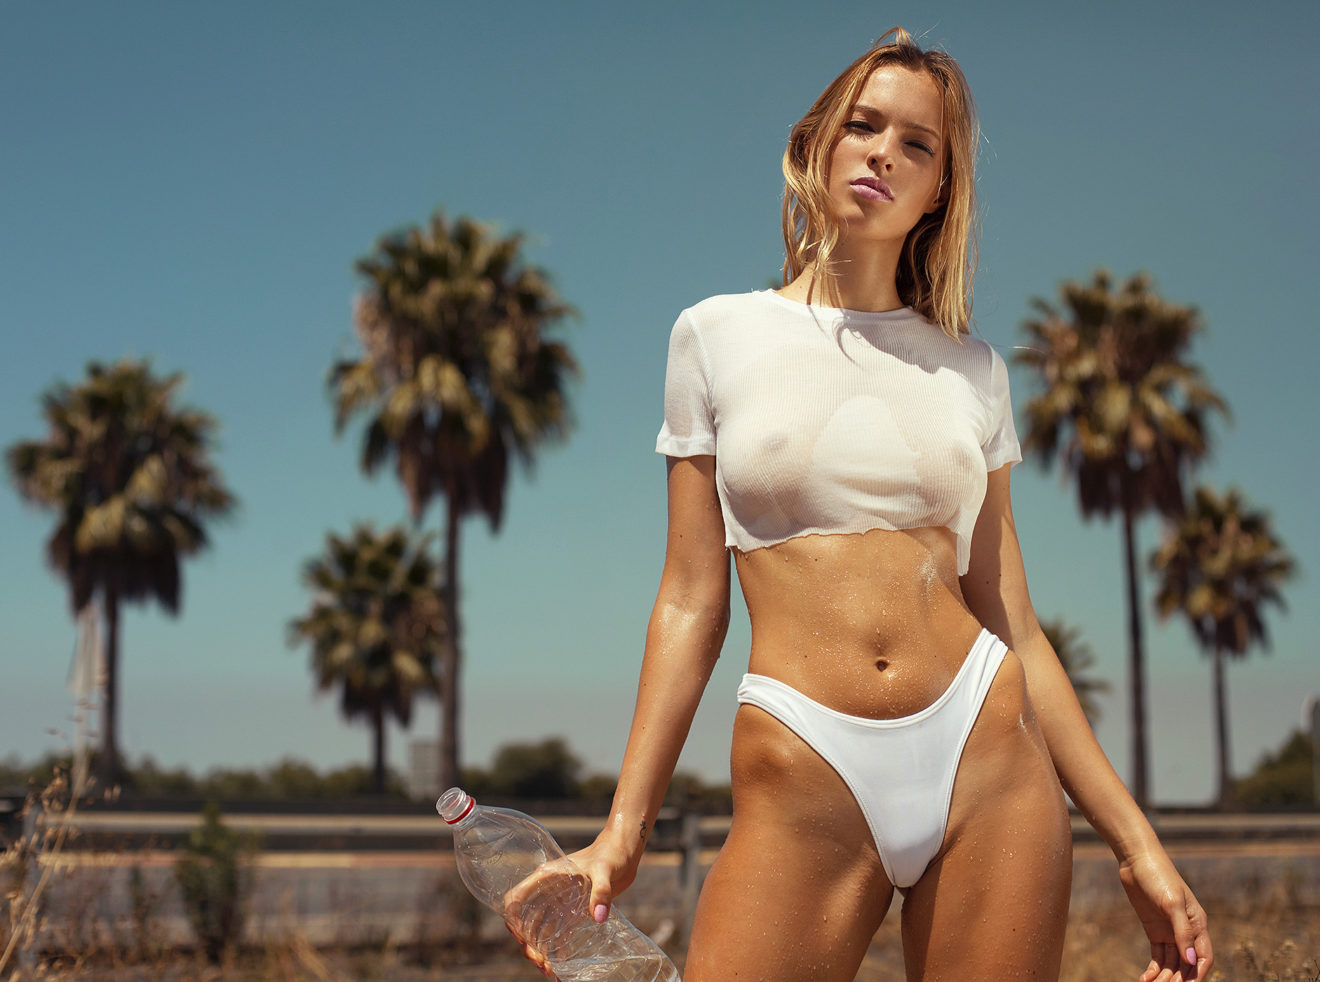 Ana Dias photoshoot for Playboy Abroad with Hellyda Cavallaro